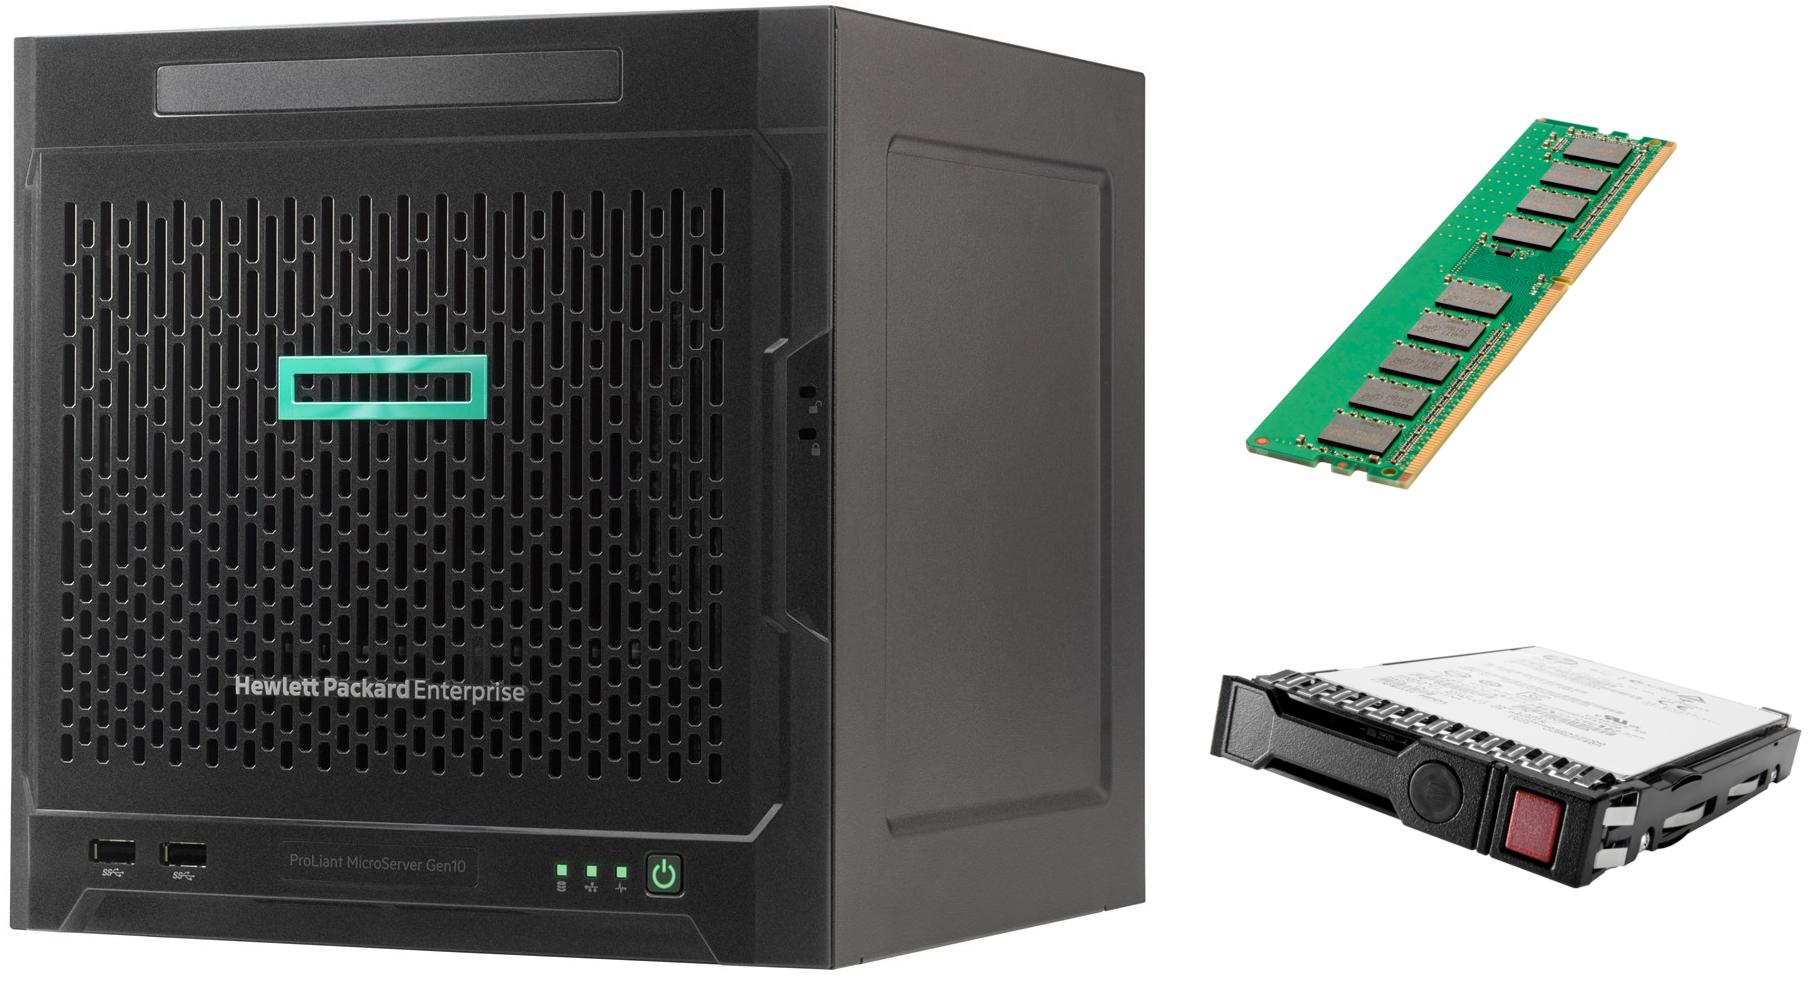 Hewlett Packard Enterprise ProLiant MicroServer Gen10 (P07203-421) + 1x 8GB DDR4 (862974-B21) + 1x 1TB HDD (843266-B21)